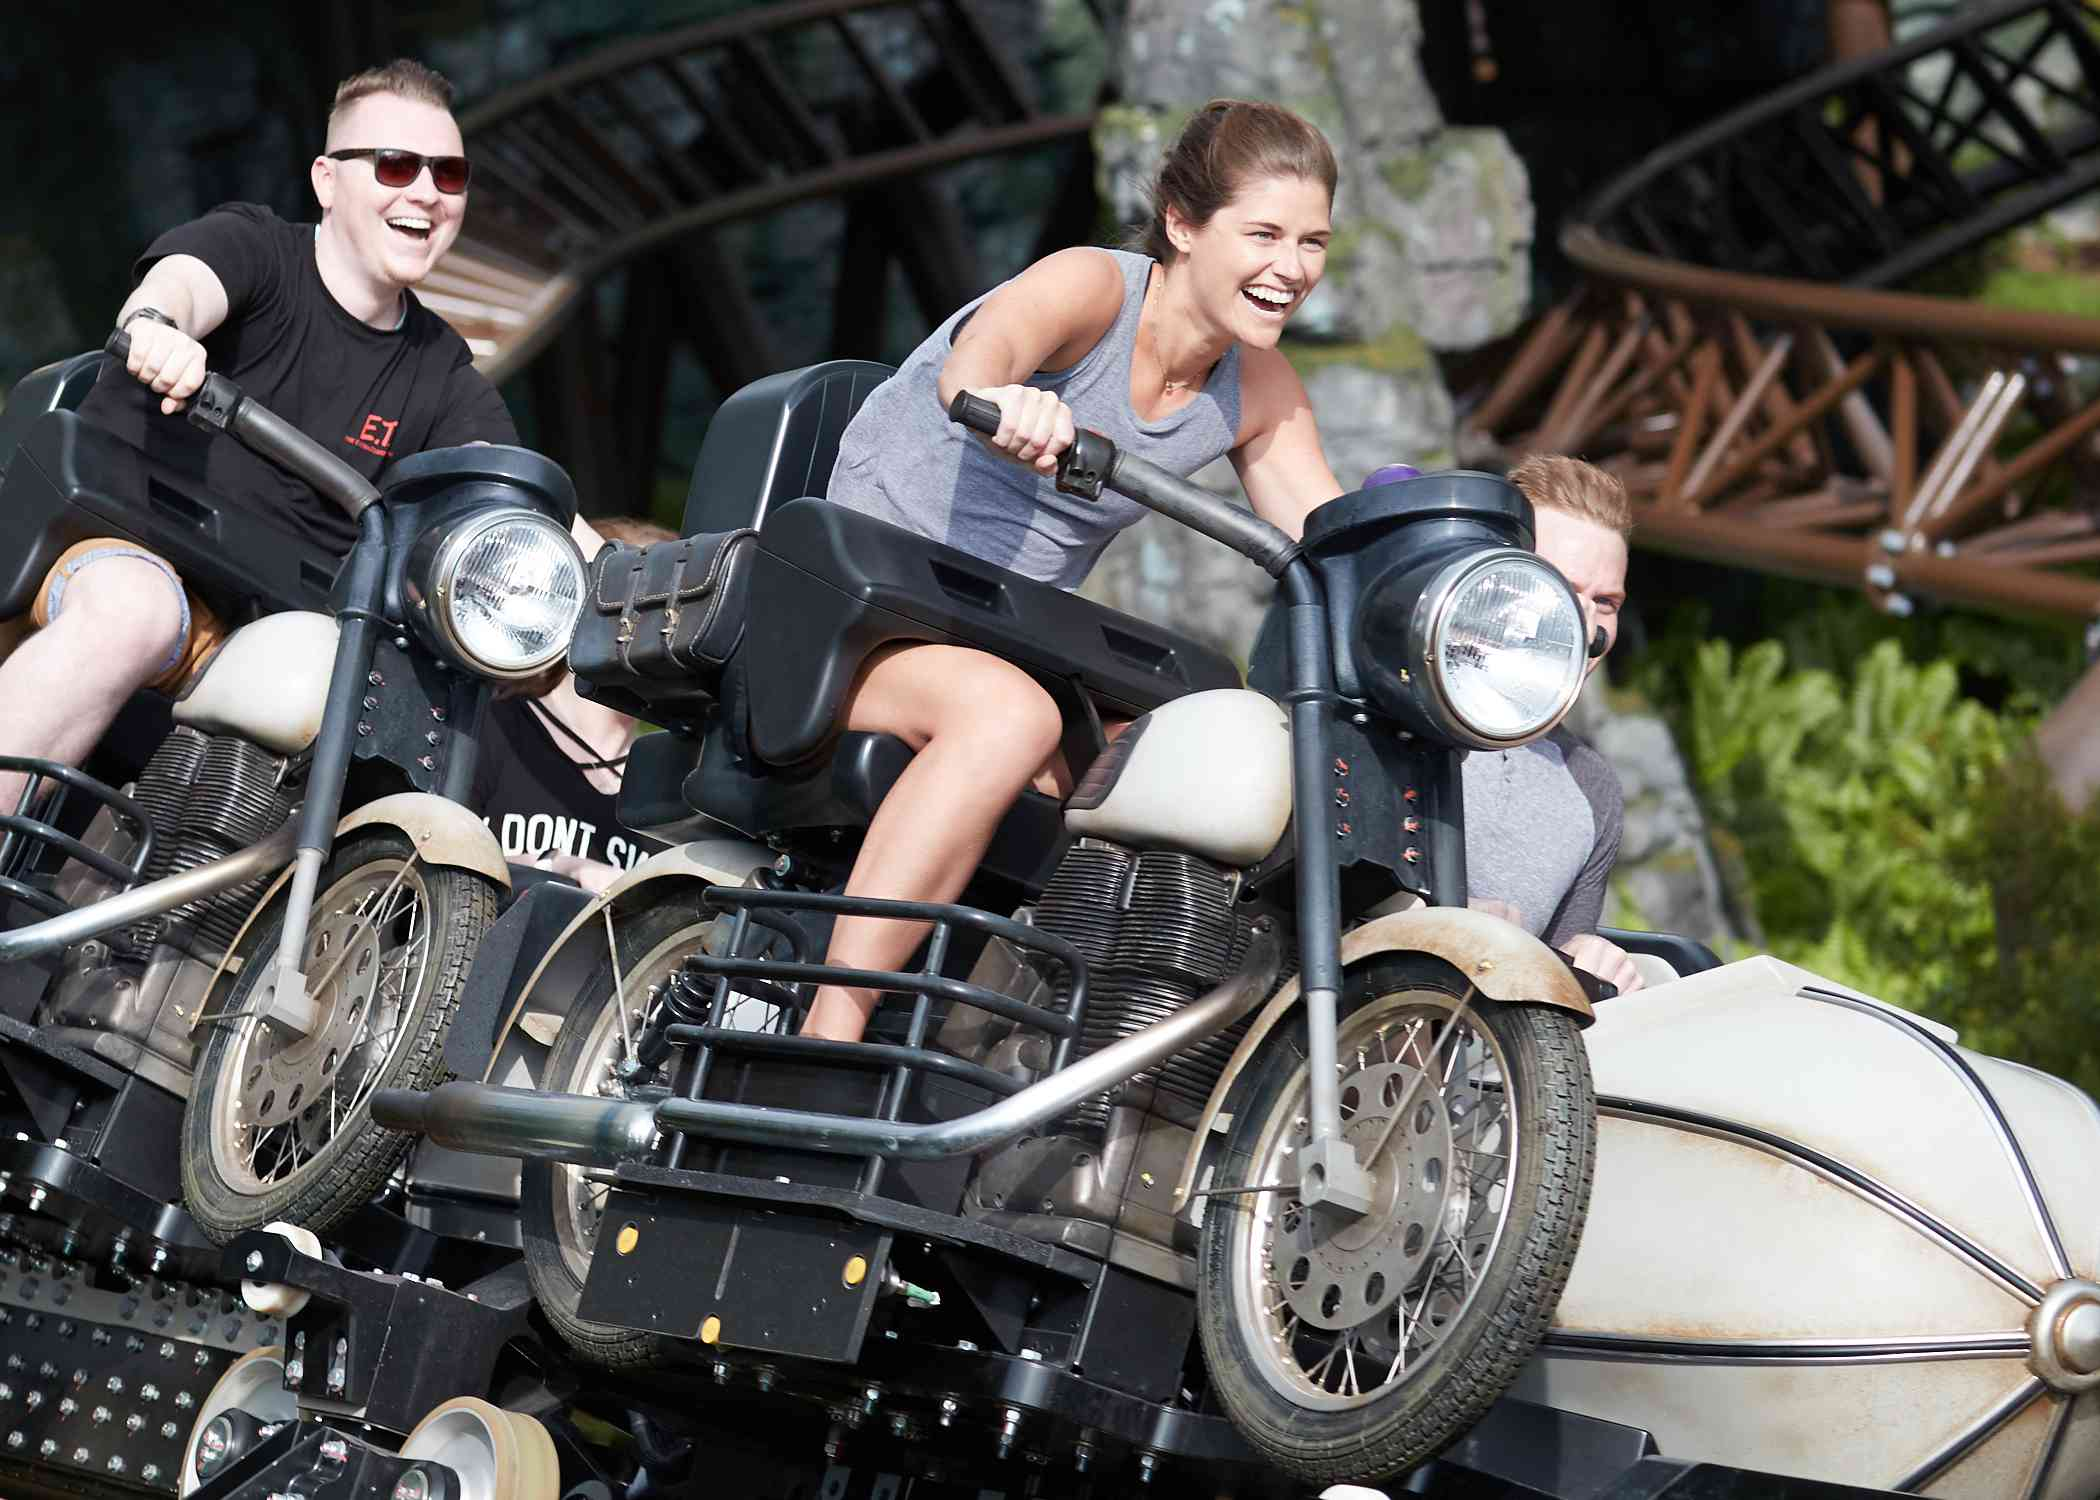 Jinetes en motocicletas Hagrid's Magical Creatures Motorbike Adventure